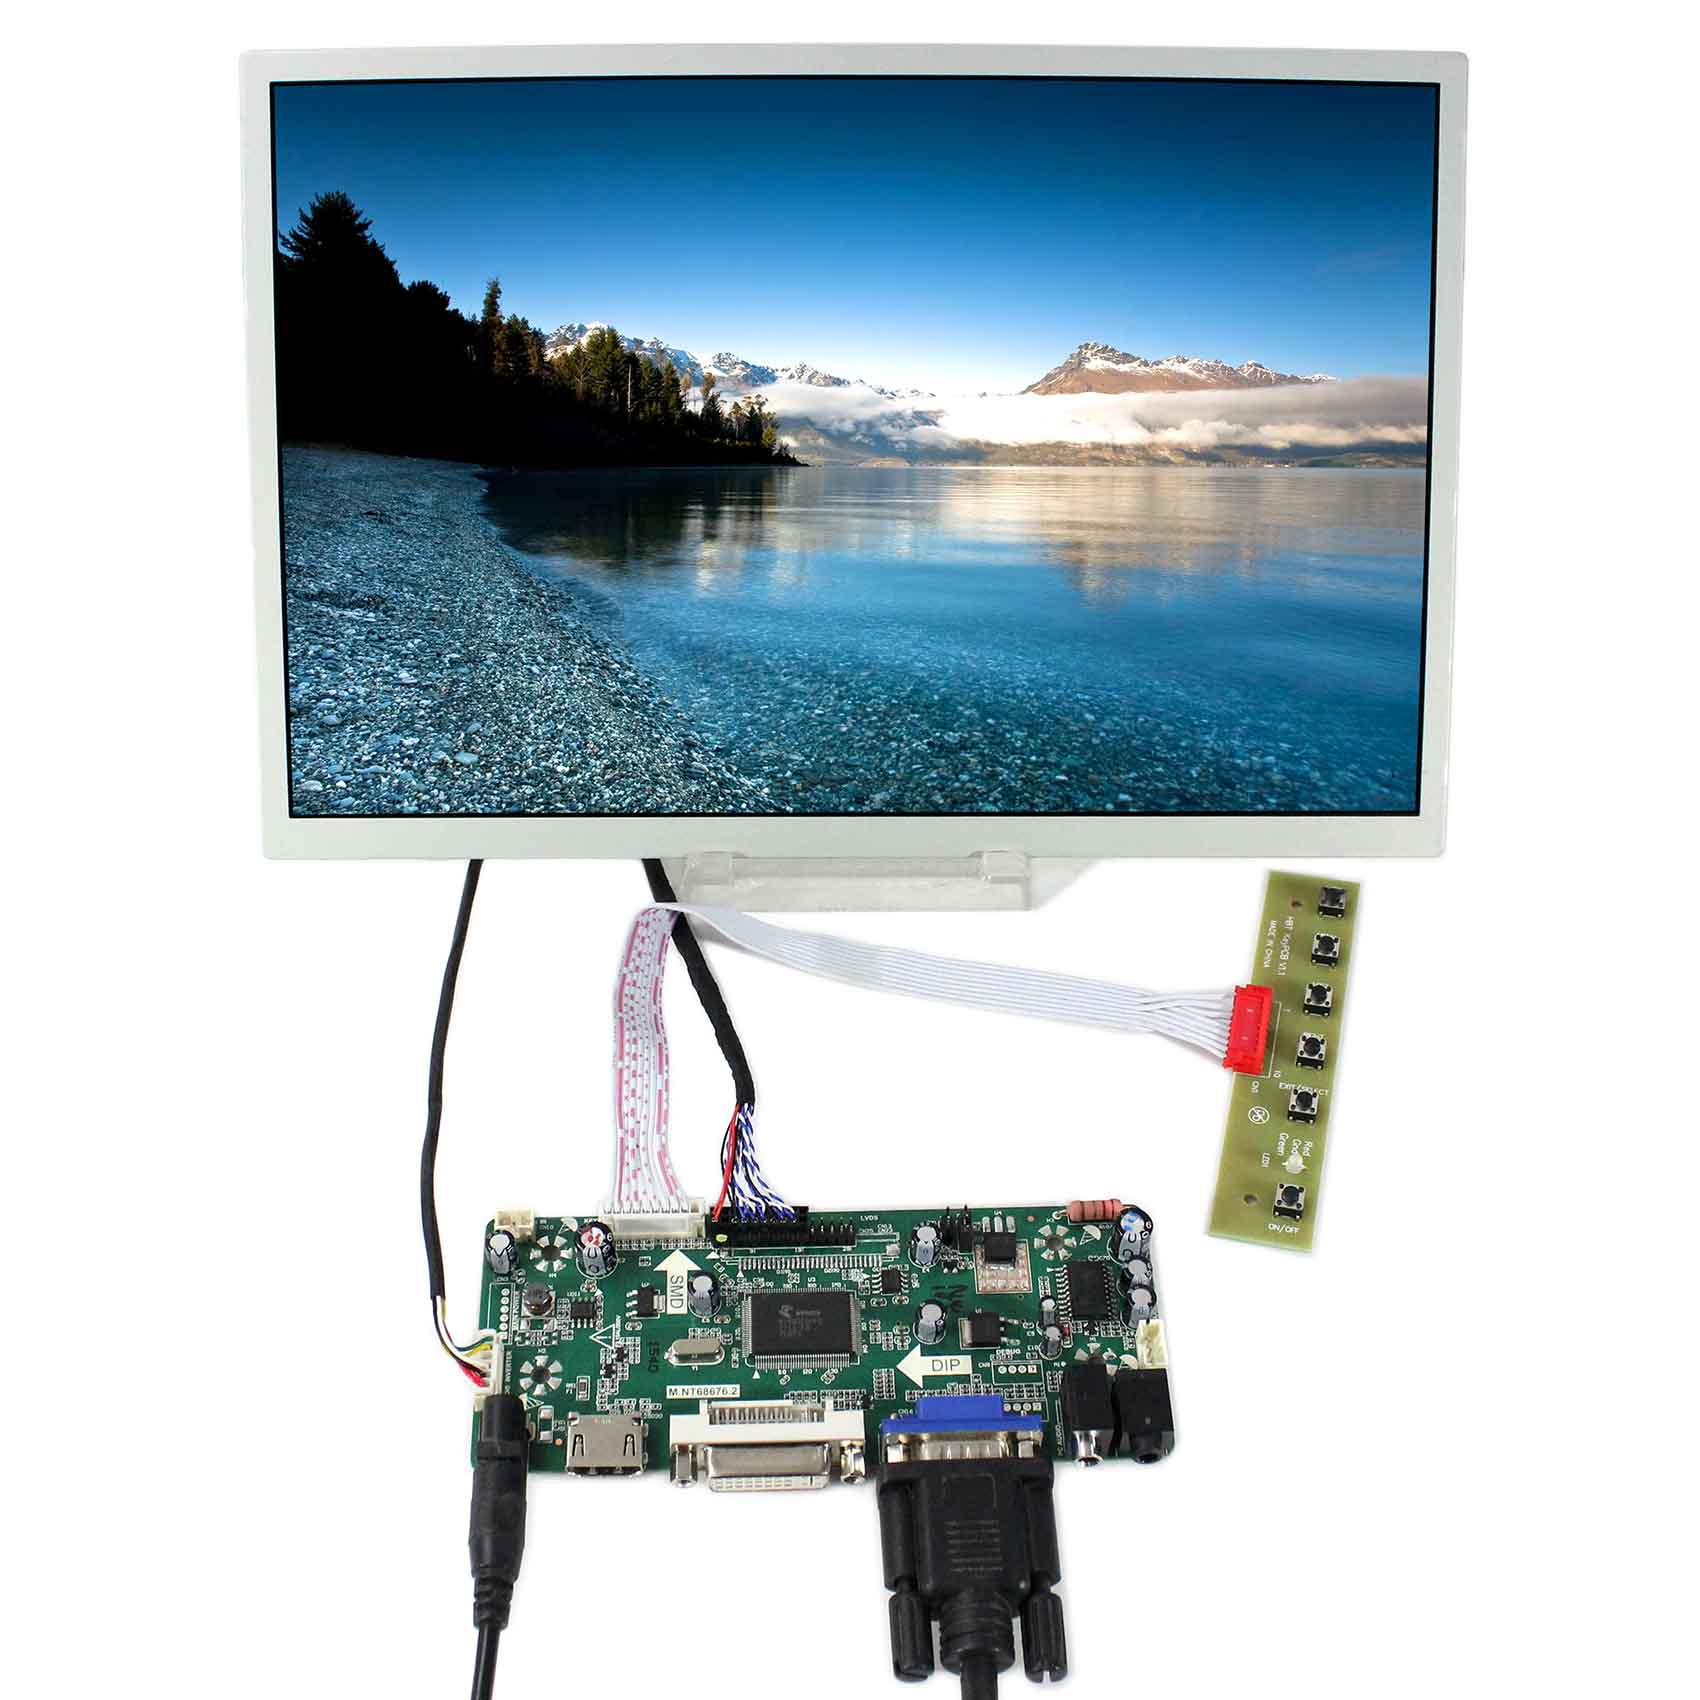 все цены на HDMI+DVI+VGA+AUDIO LCD Controller Board With 12.1inch 1280x800 LQ121K1LG52 LCD Screen онлайн